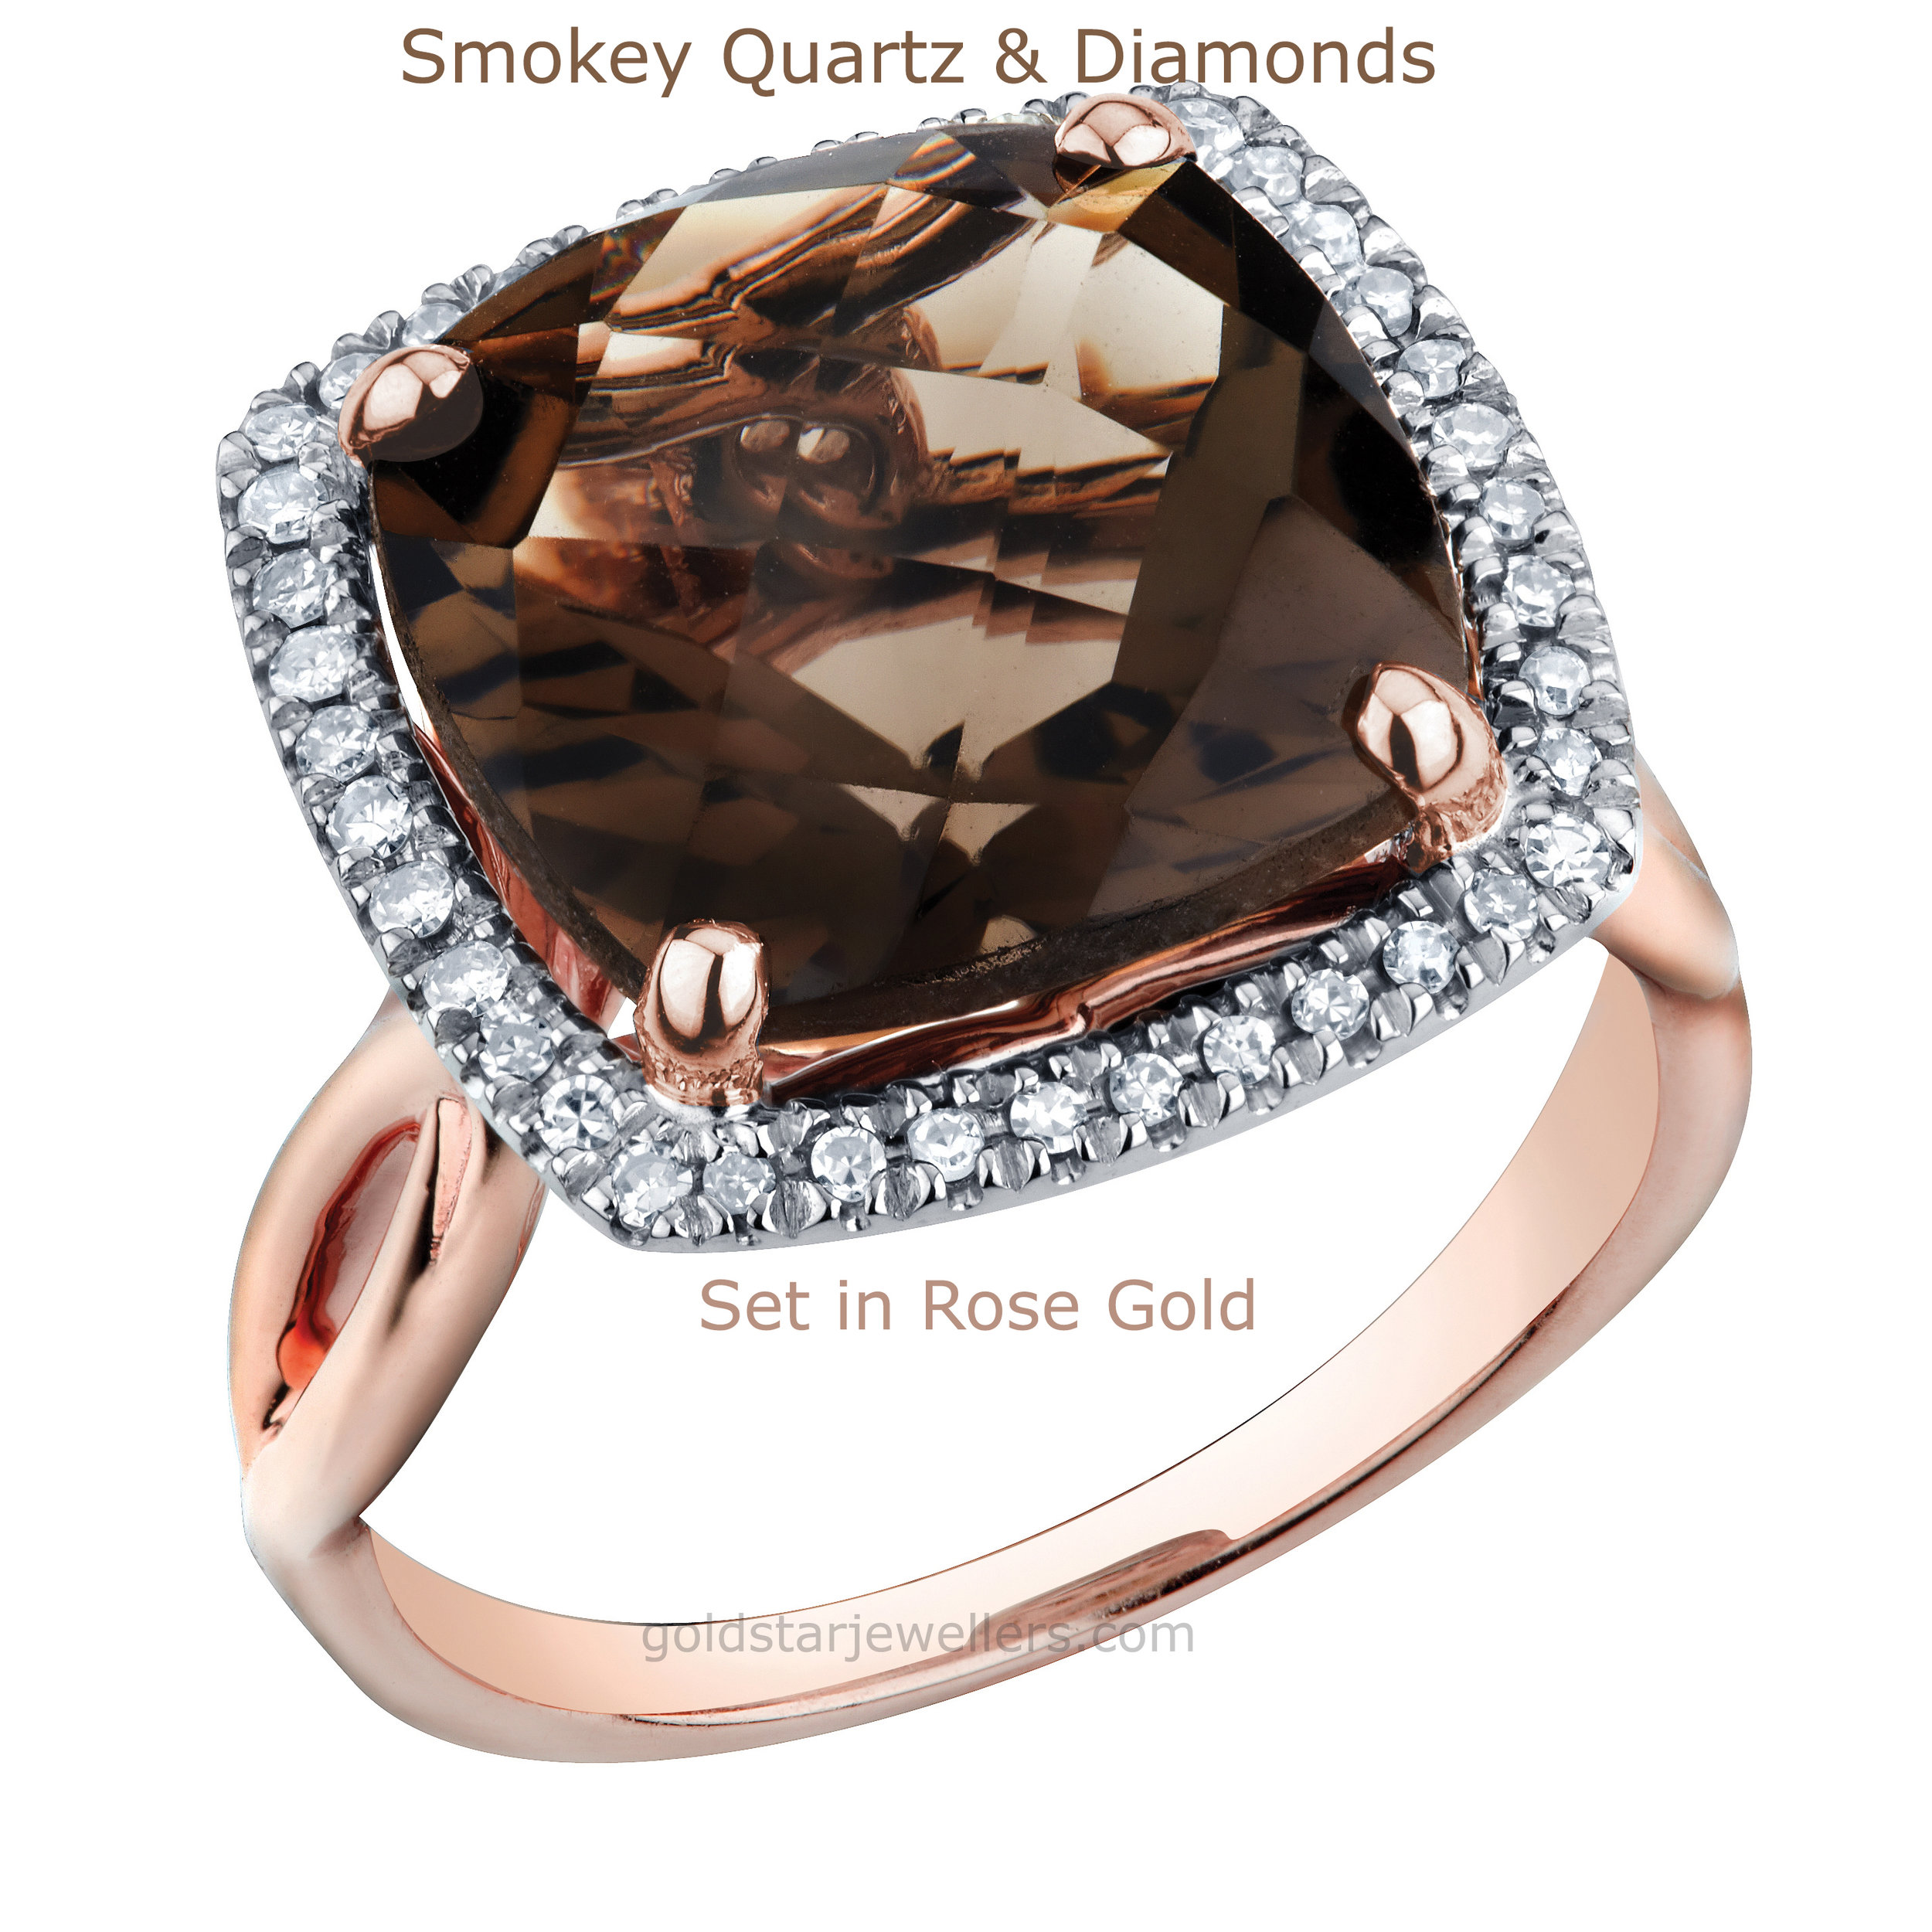 smokey quartz and diamonds